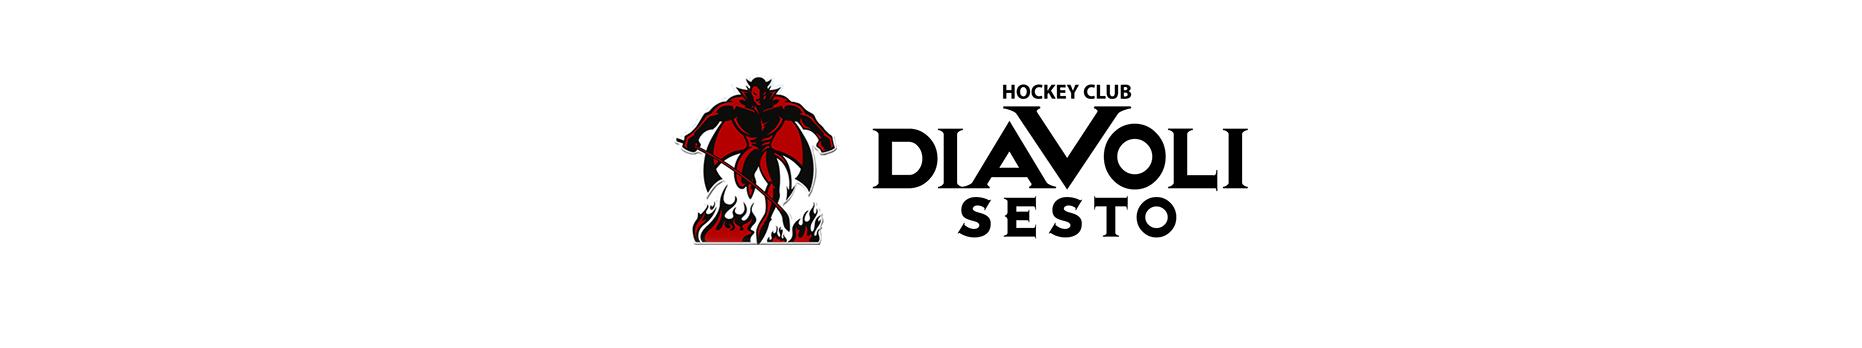 Hokey club diavoli di sesto logo